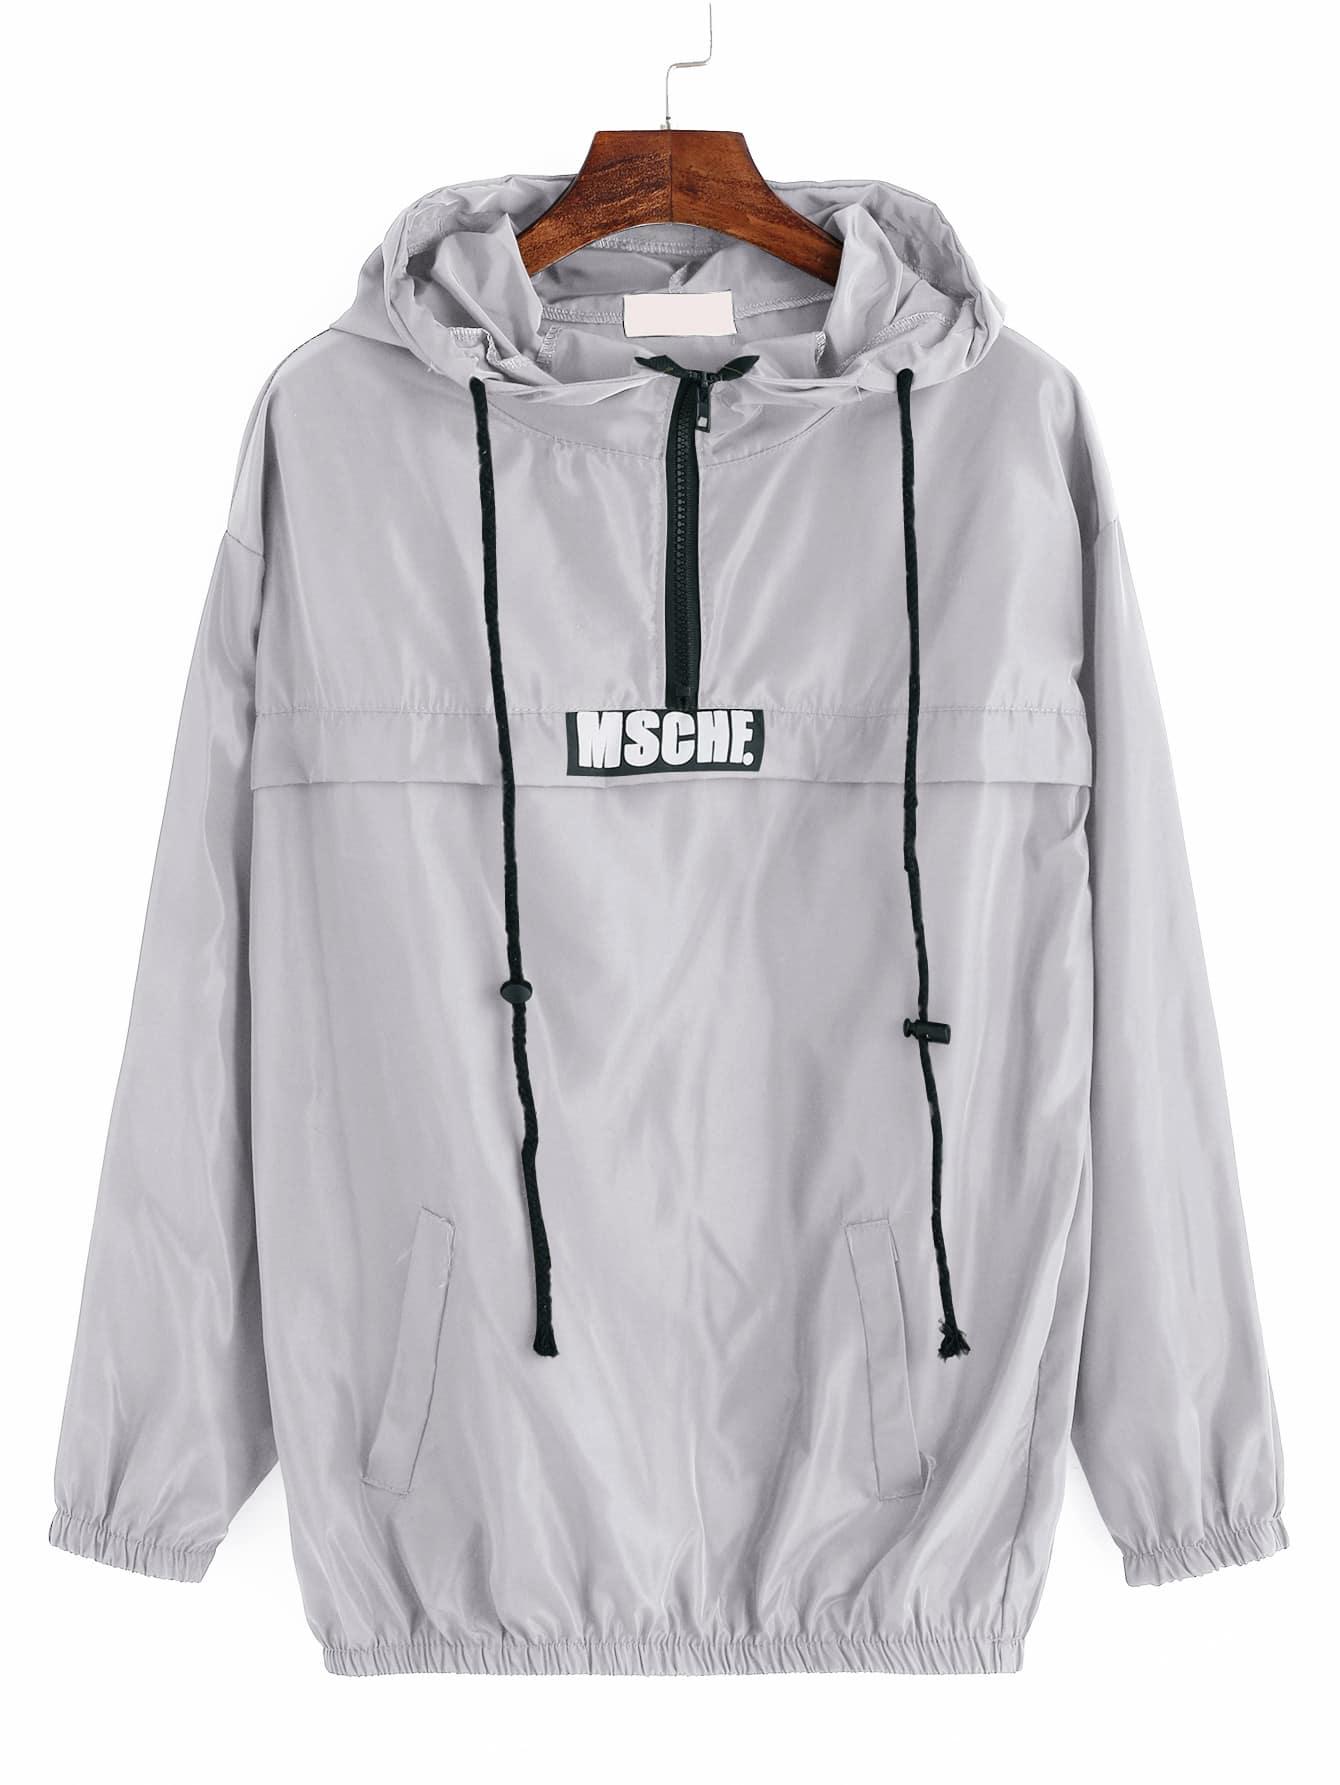 Фото Grey Print Drawstring Hooded Sweatshirt With Zipper Detail. Купить с доставкой